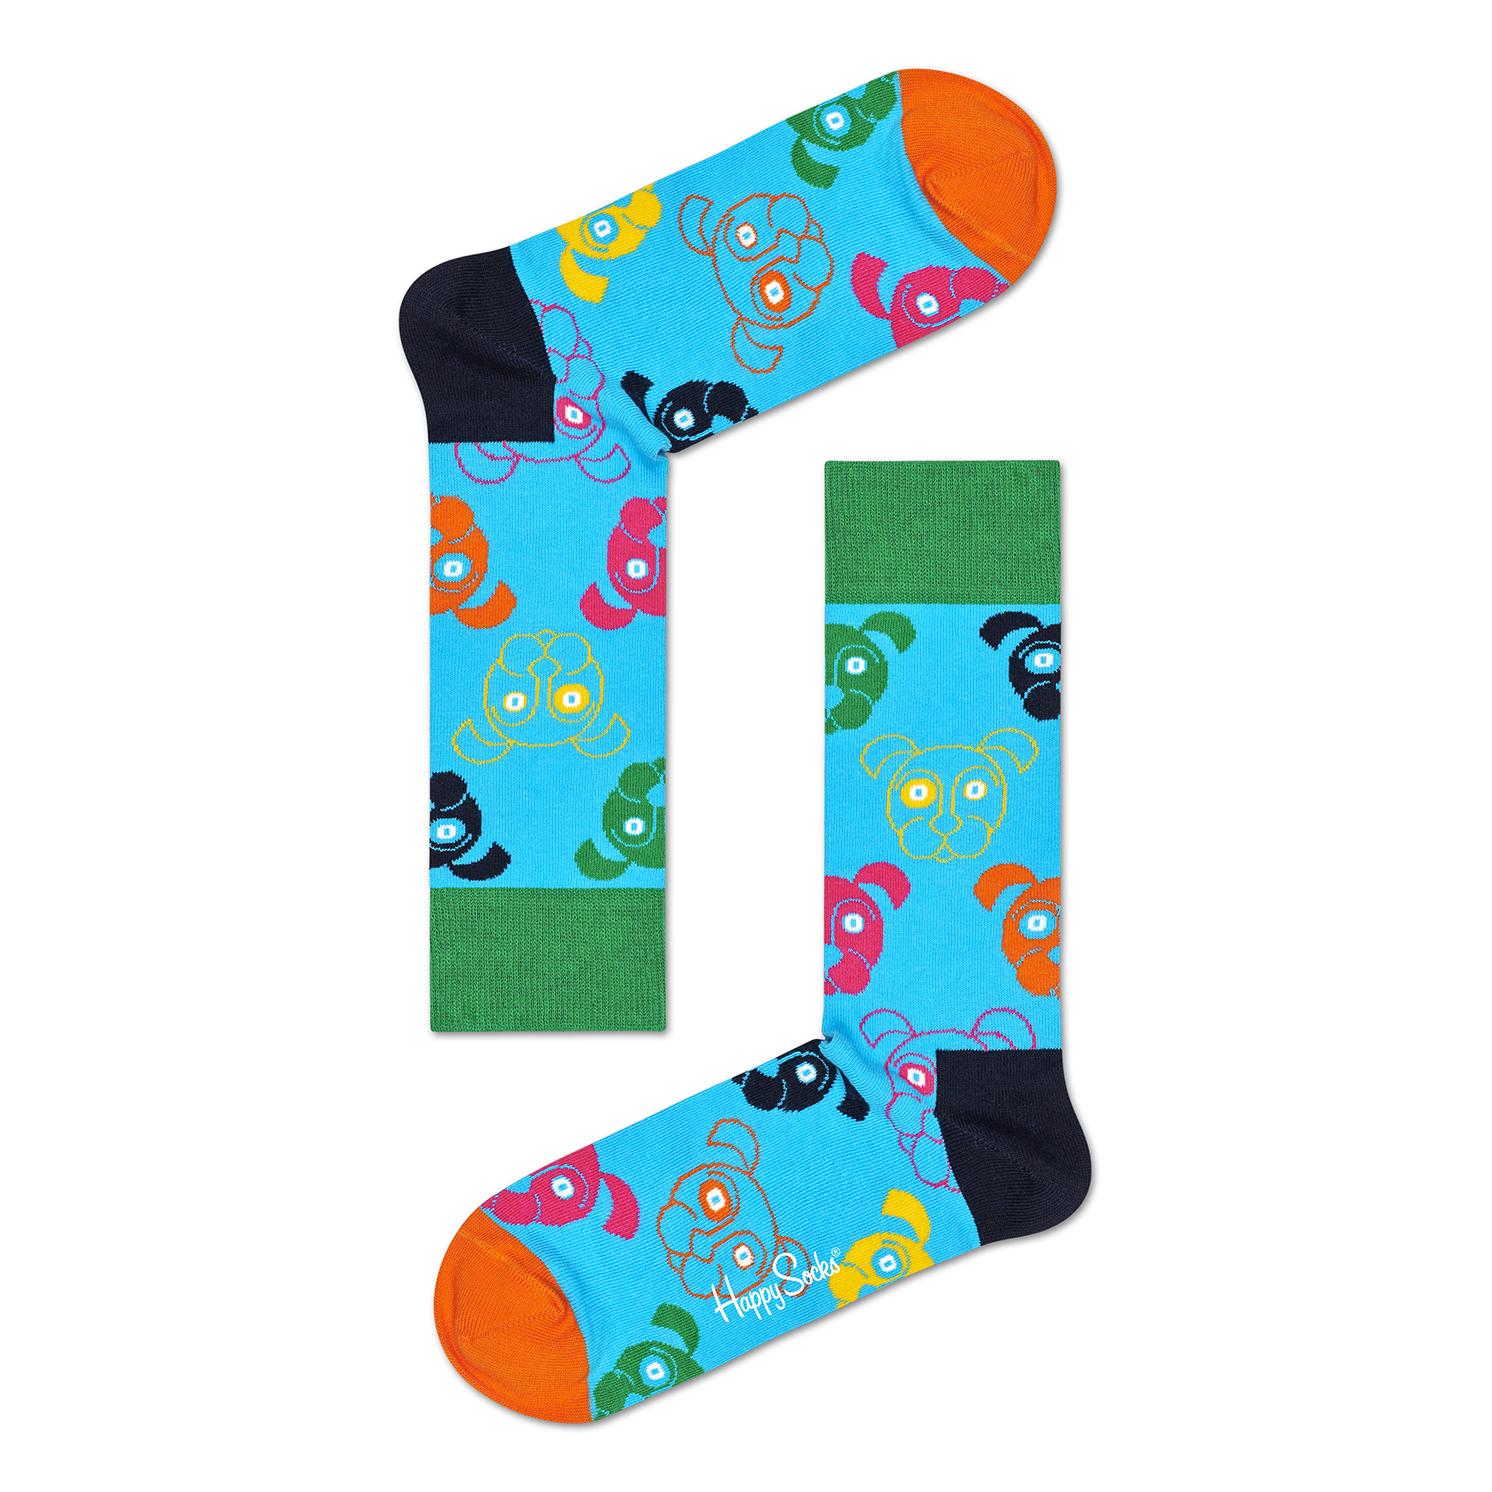 Happy Socks – Set of 3 Pairs of Mixed Dog Socks in Presentation Gift Box